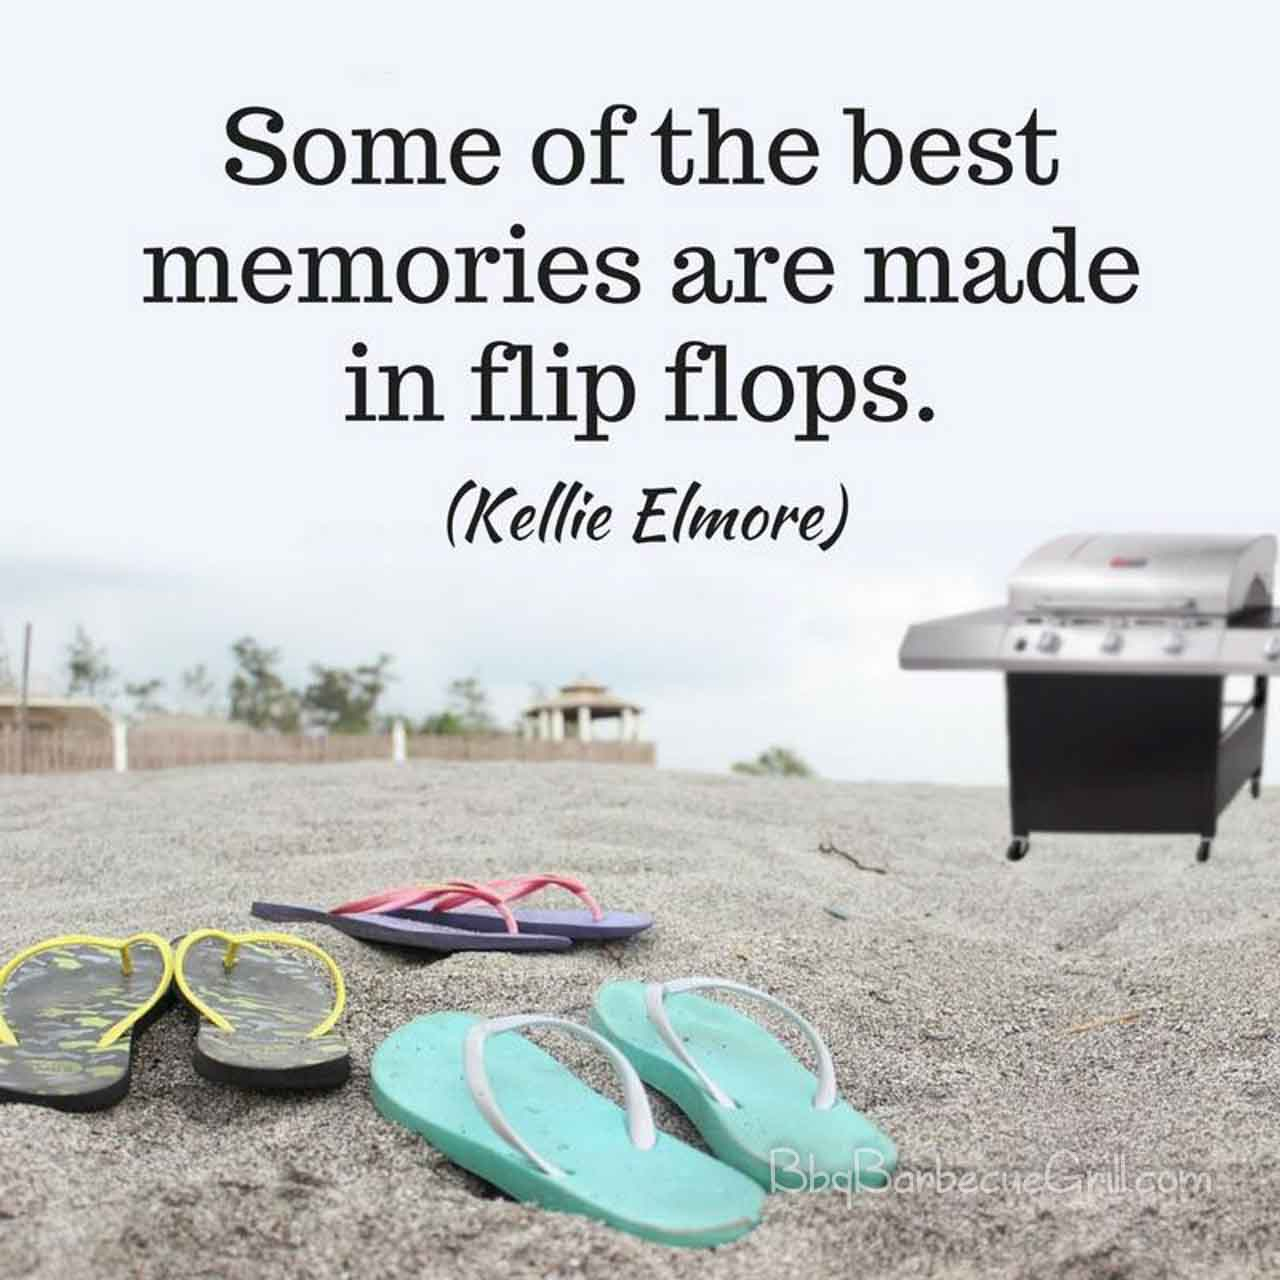 Some of the best memories are made in flip flops. (Kellie Elmore)